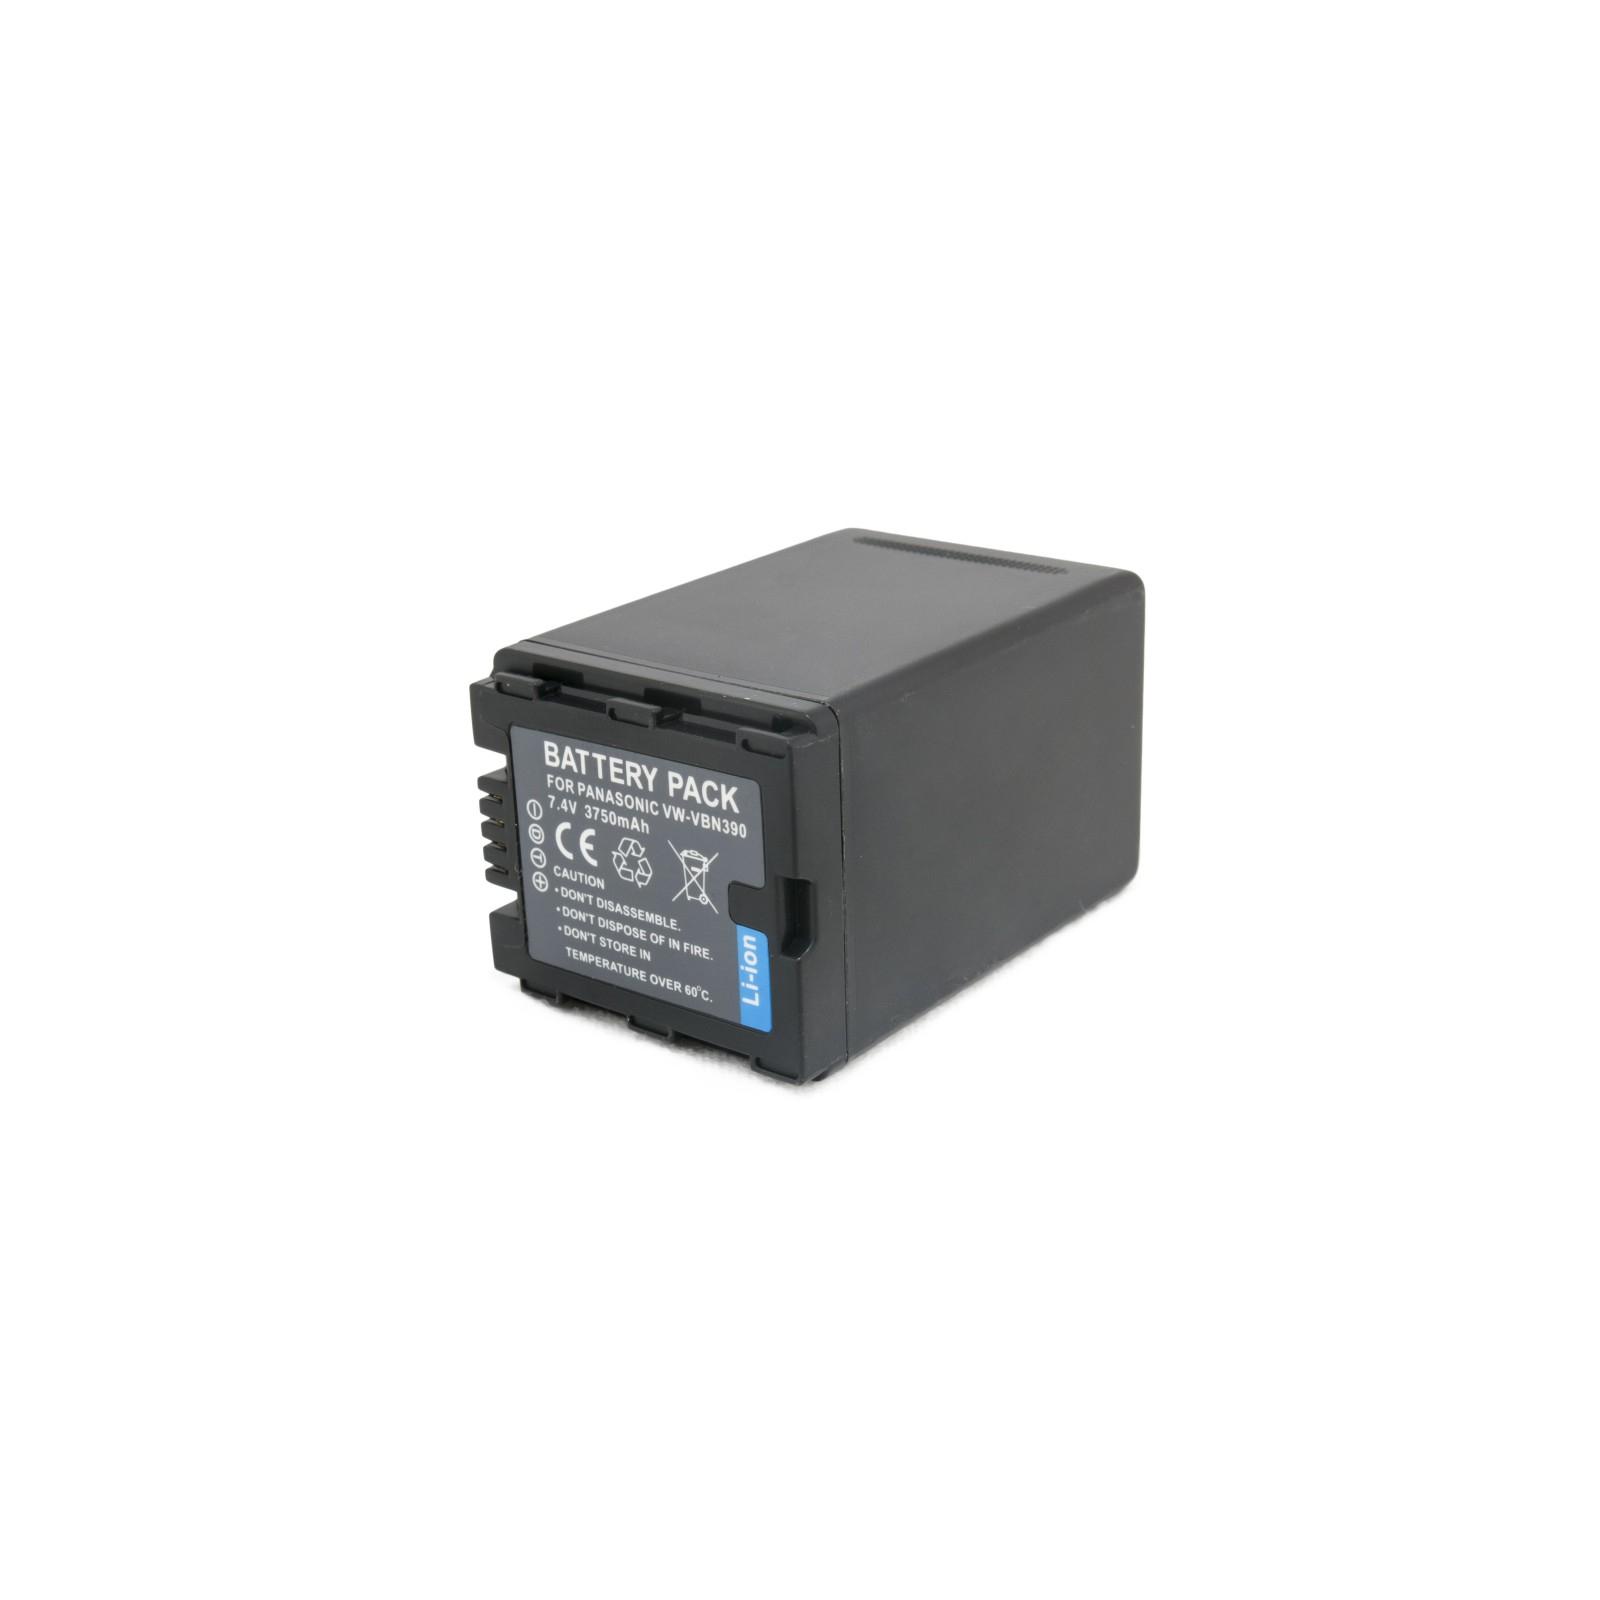 Аккумулятор к фото/видео EXTRADIGITAL Panasonic VW-VBN390 (DV00DV1365) изображение 2